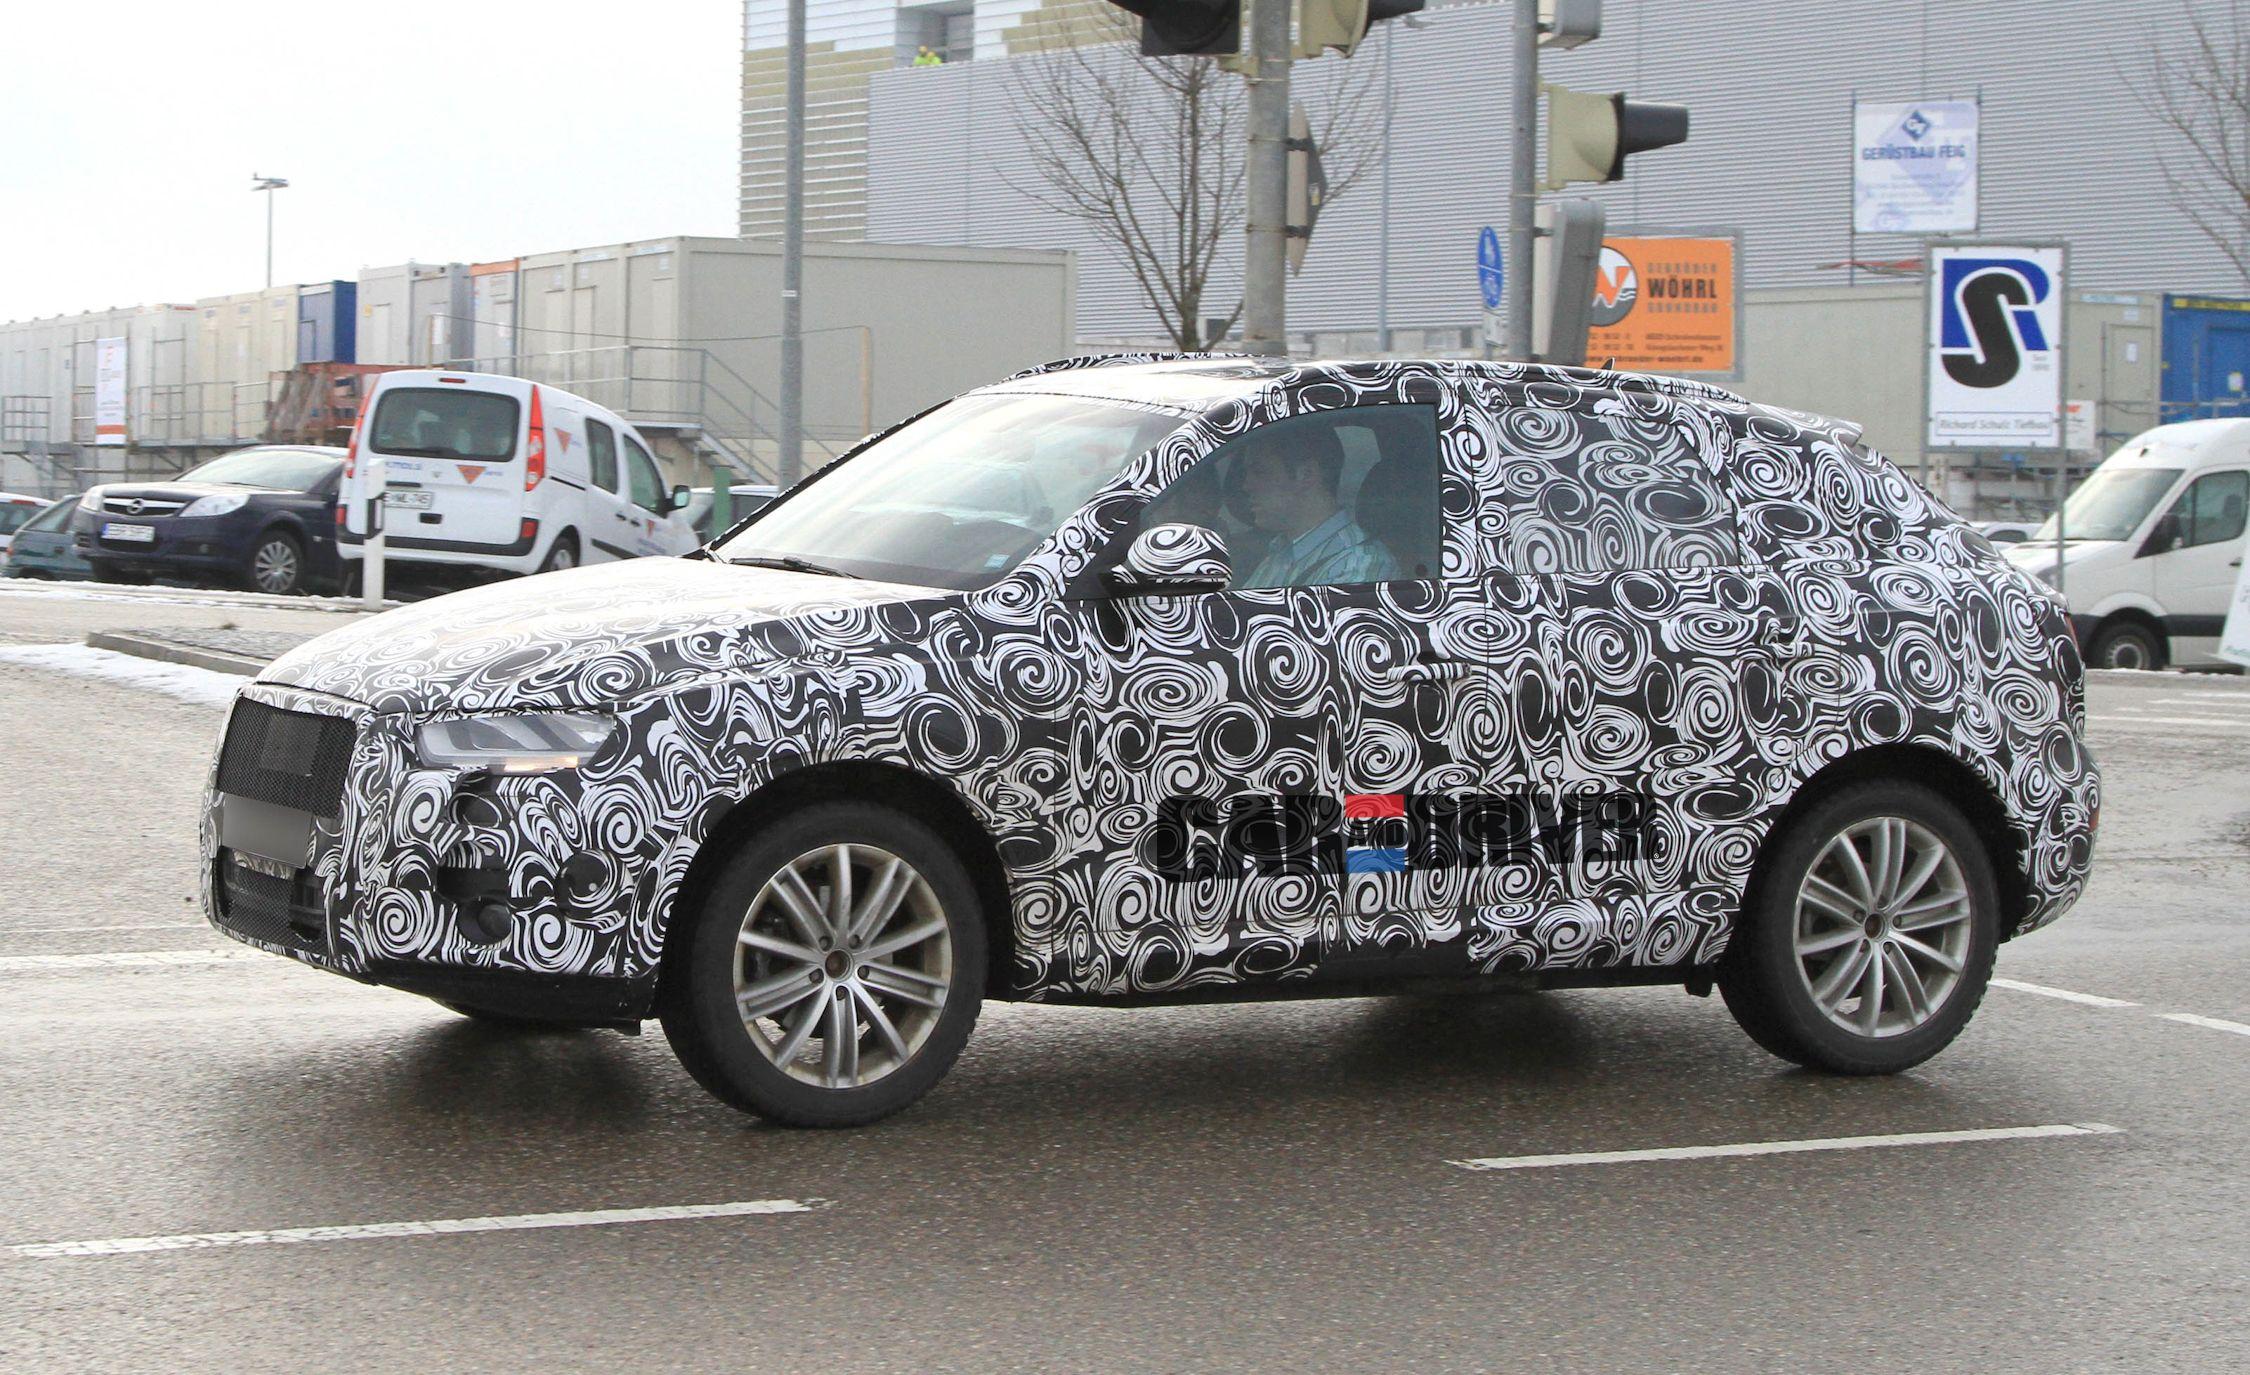 2012 Audi Q3 Spy Photos